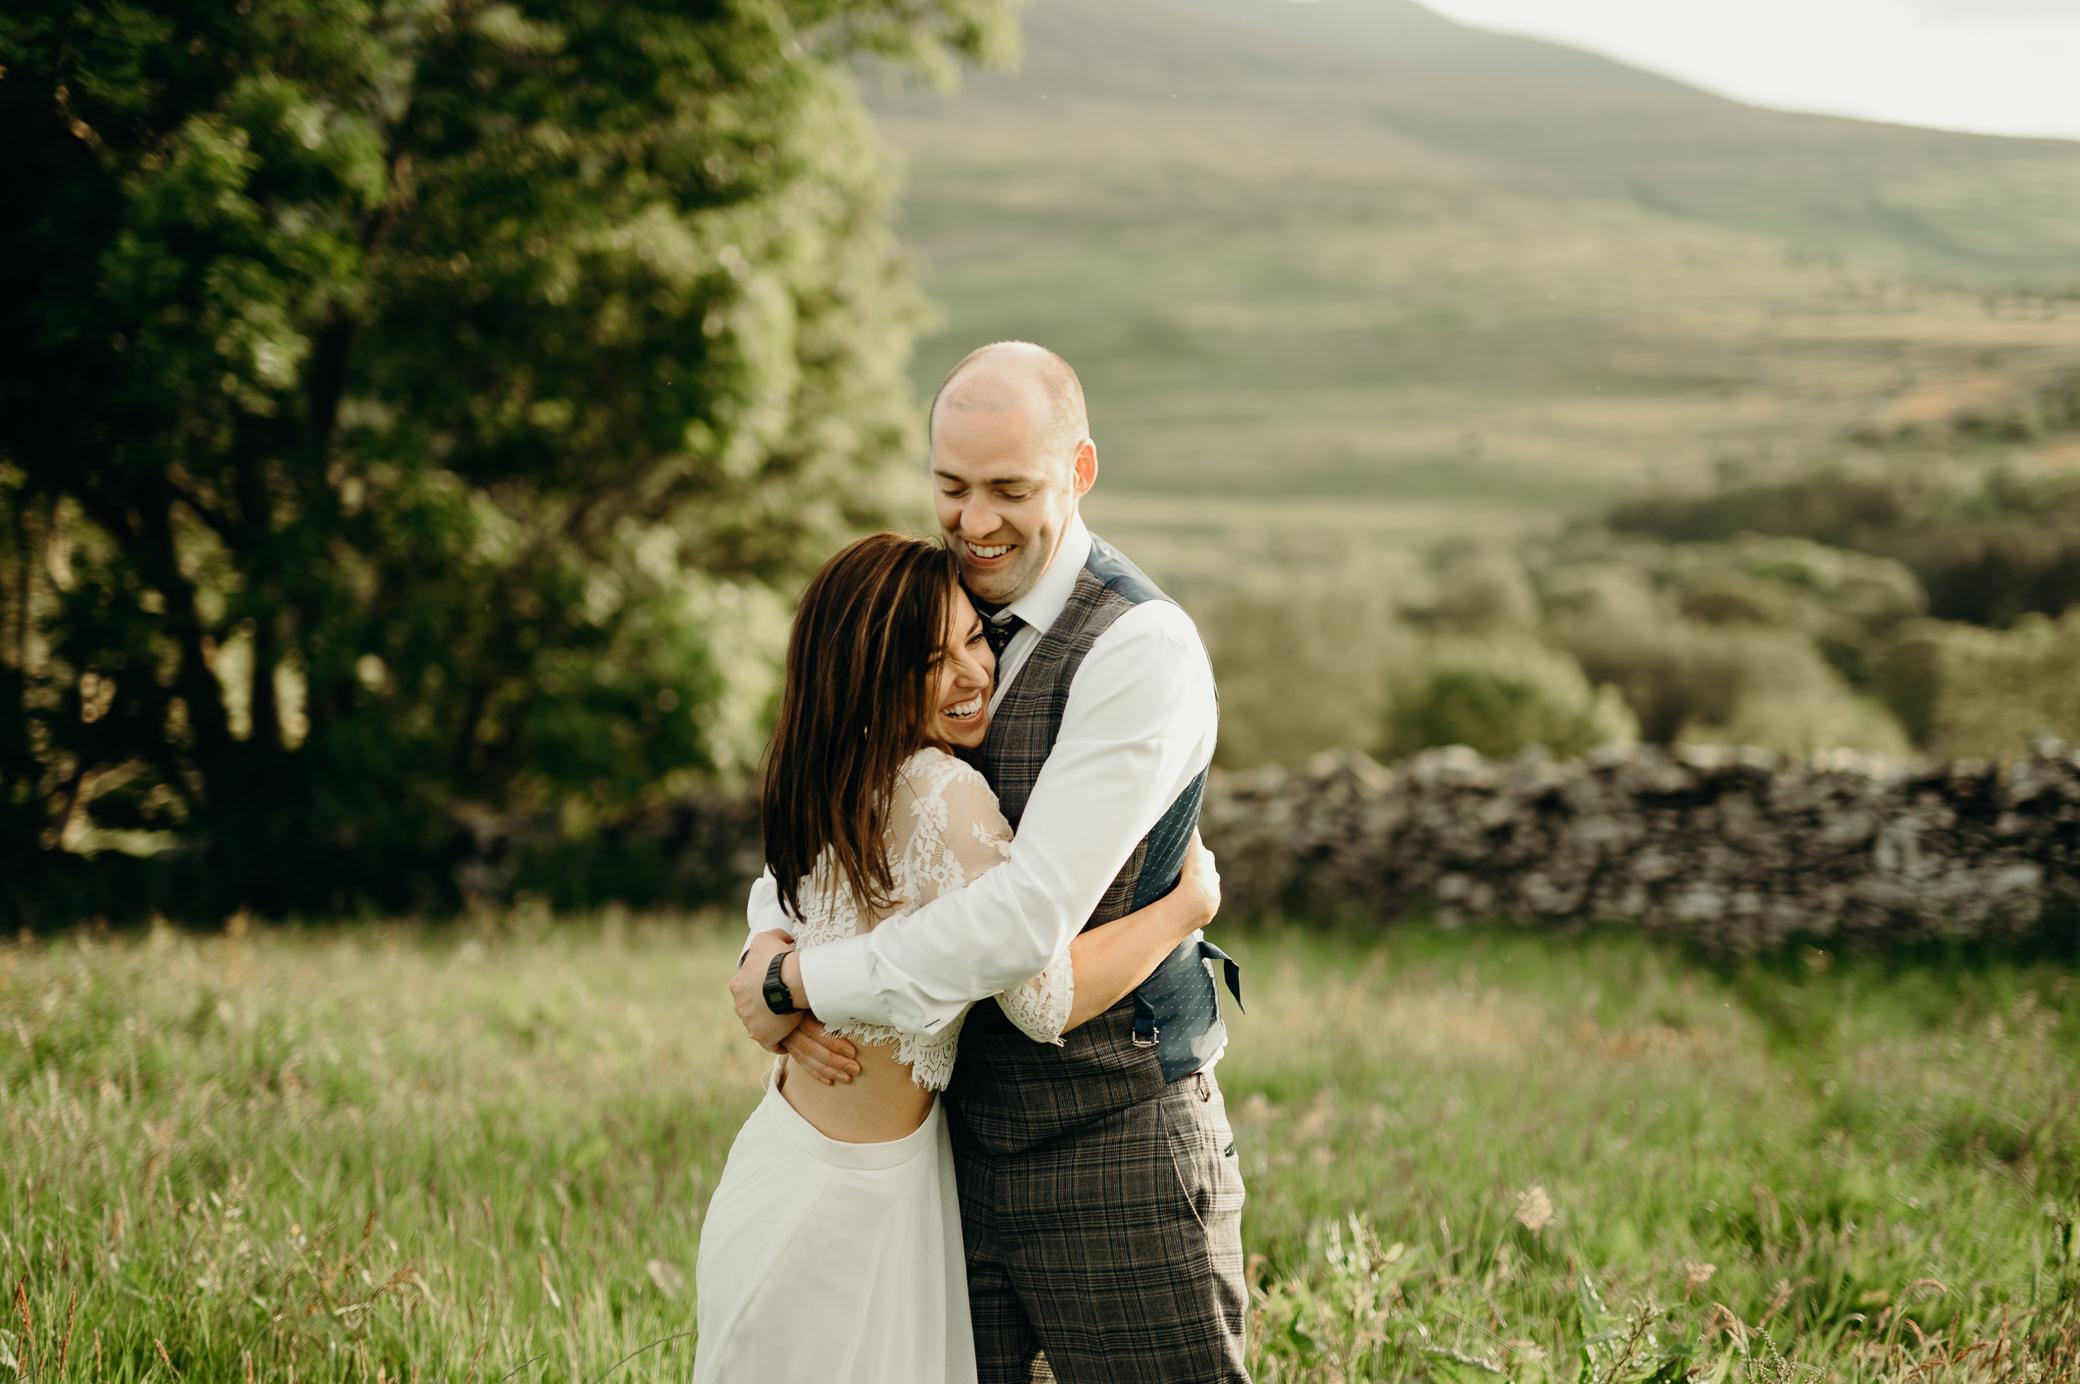 Carmel&Marcus_Wedding photographer Europe-120.jpg